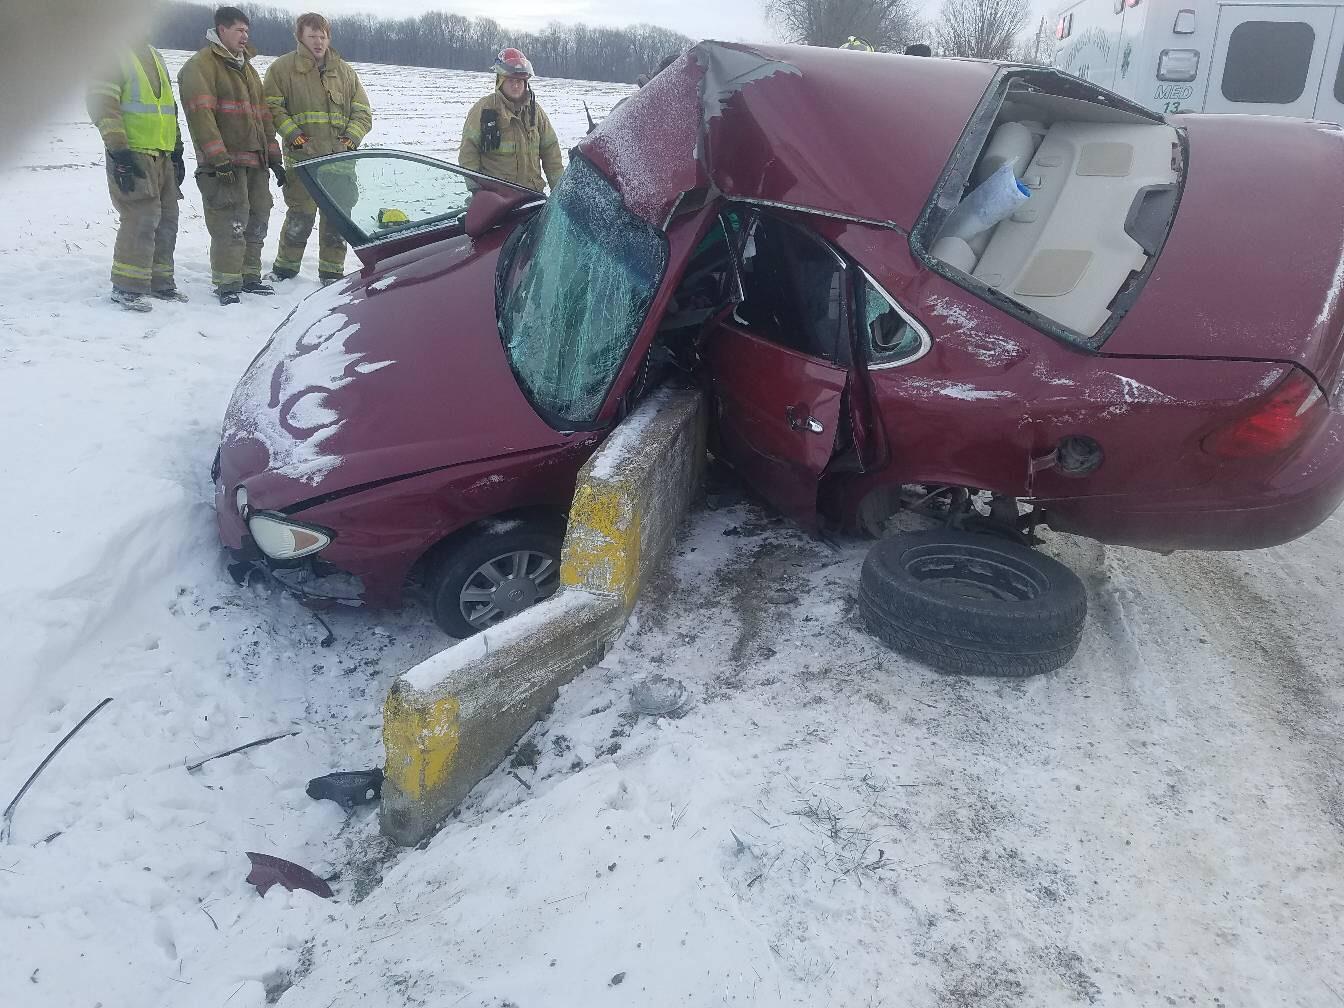 vermillion county fatality_1514516754500.jpg.jpg